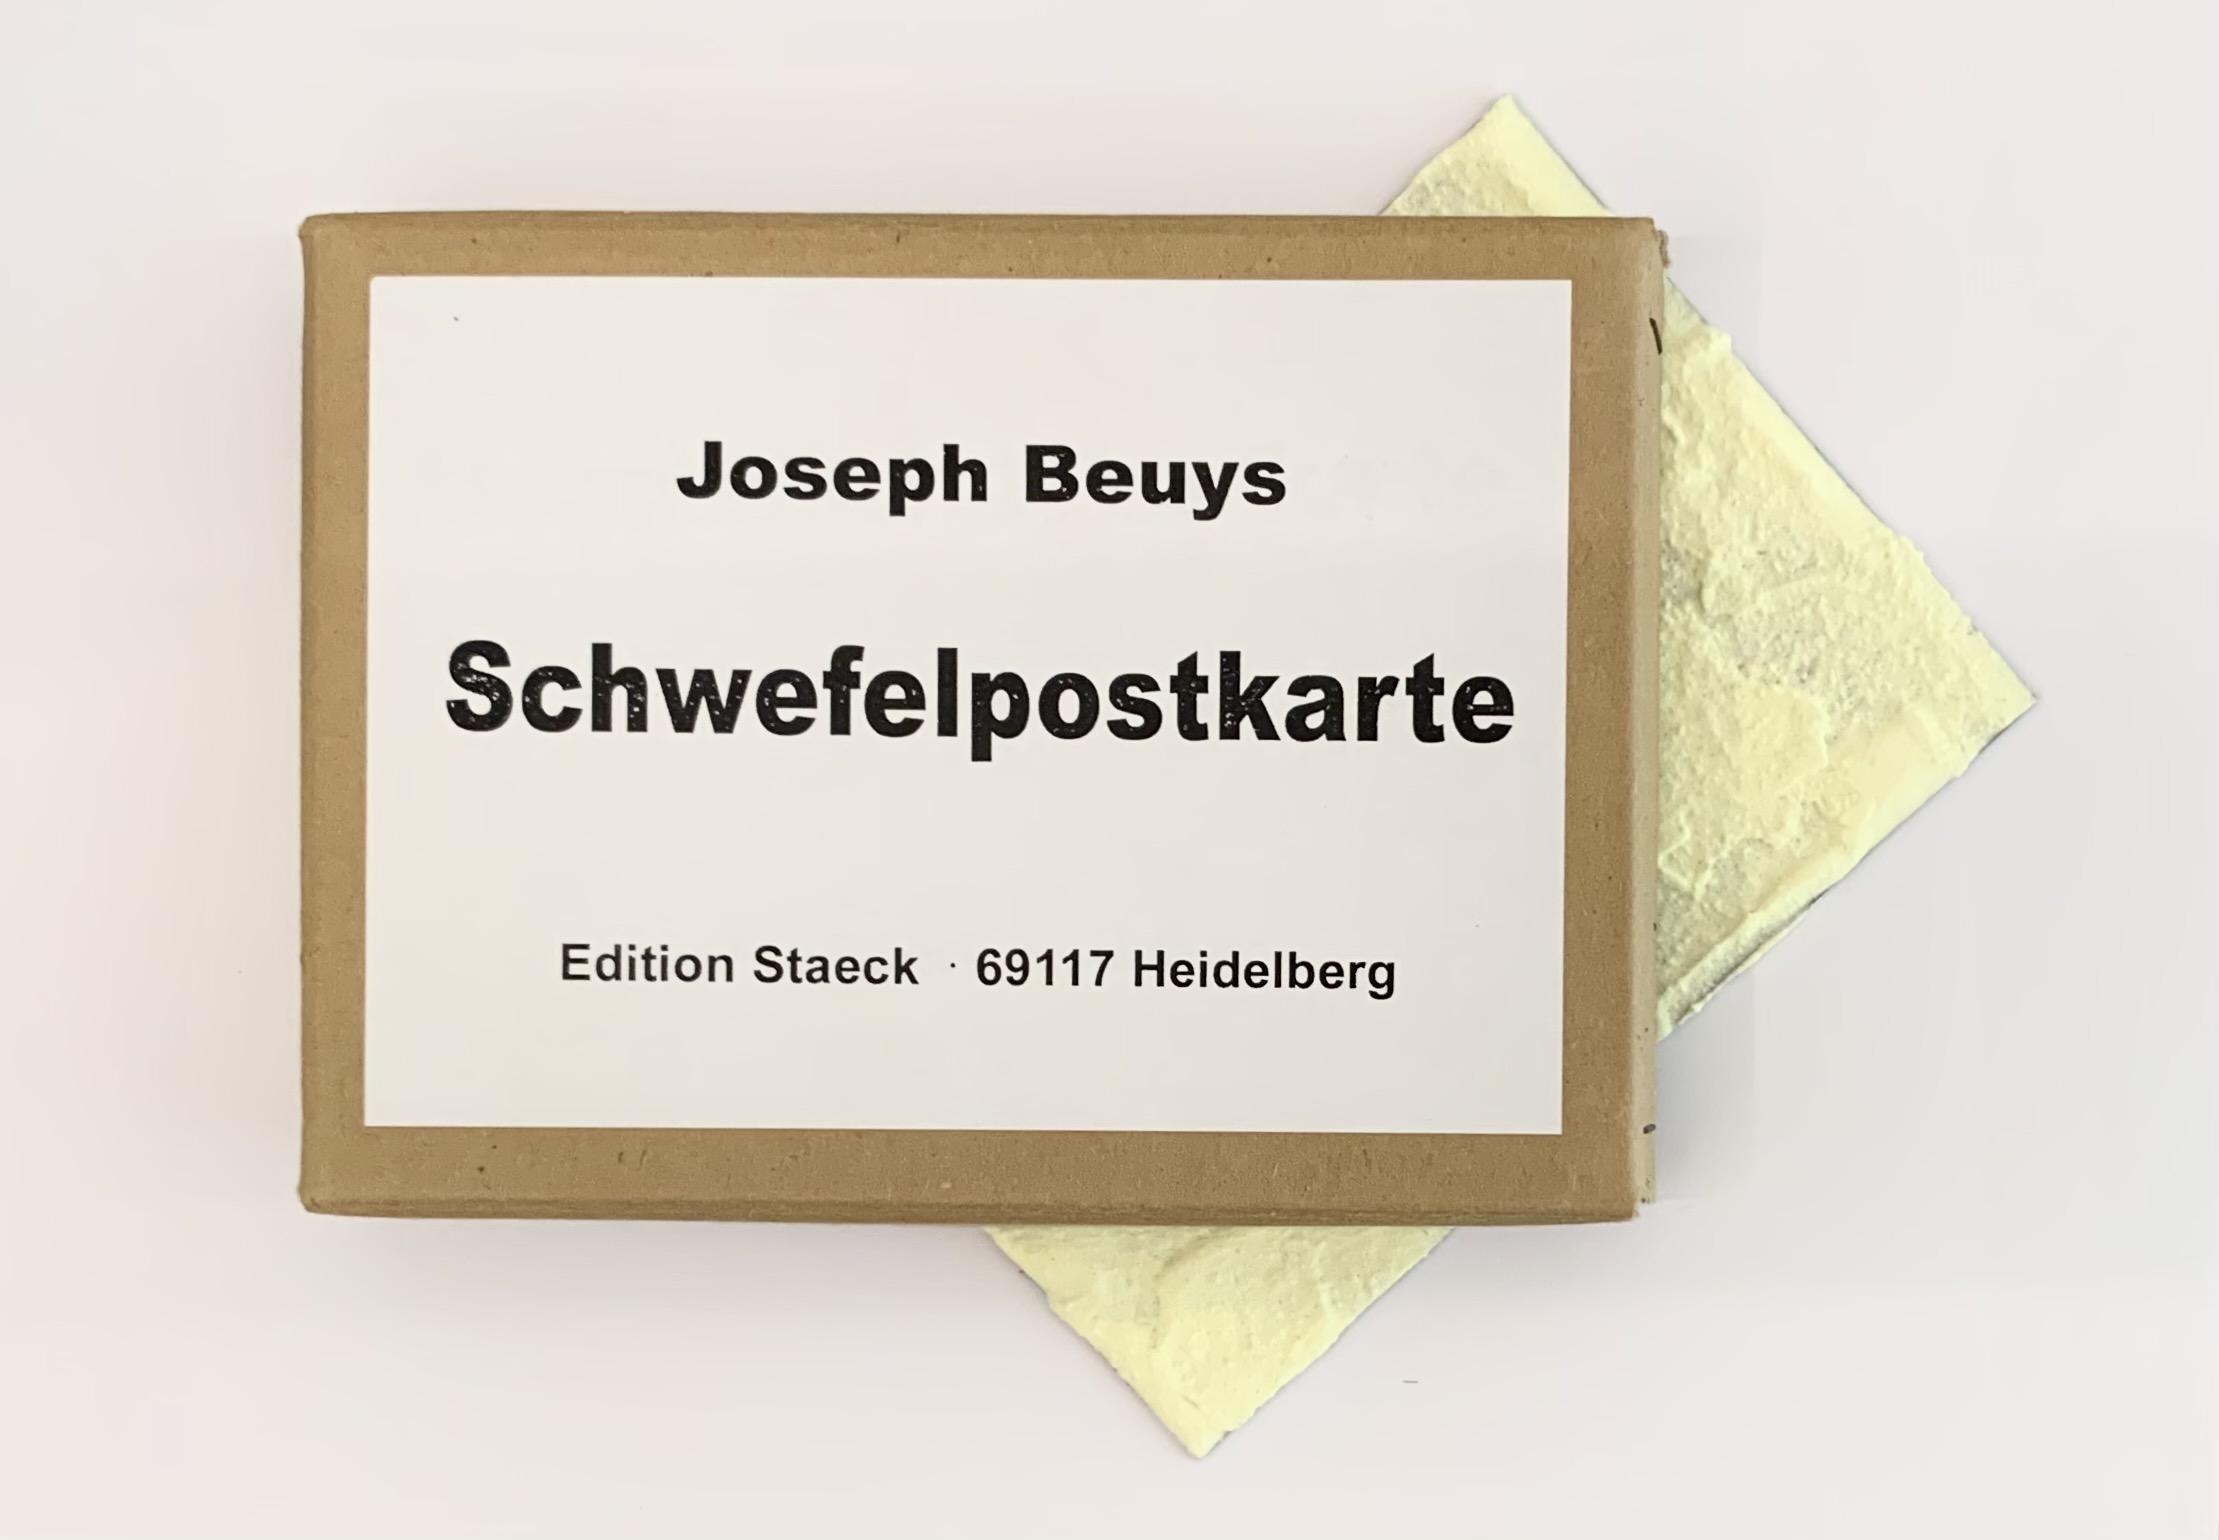 Joseph Beuys - Schwefelpostkarte